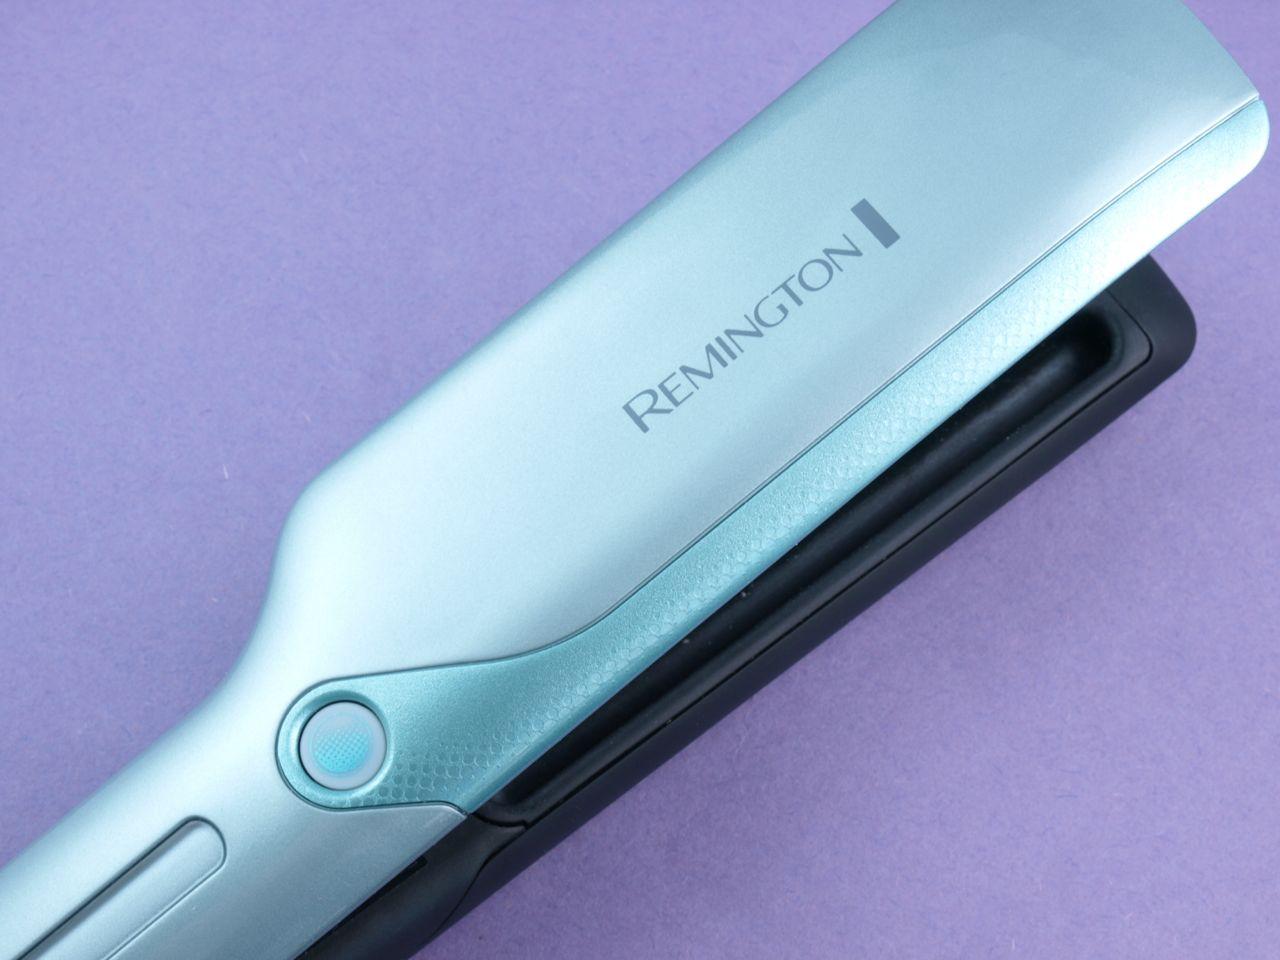 Remington T Studio PROtect Hair Straightener with Vapor ...